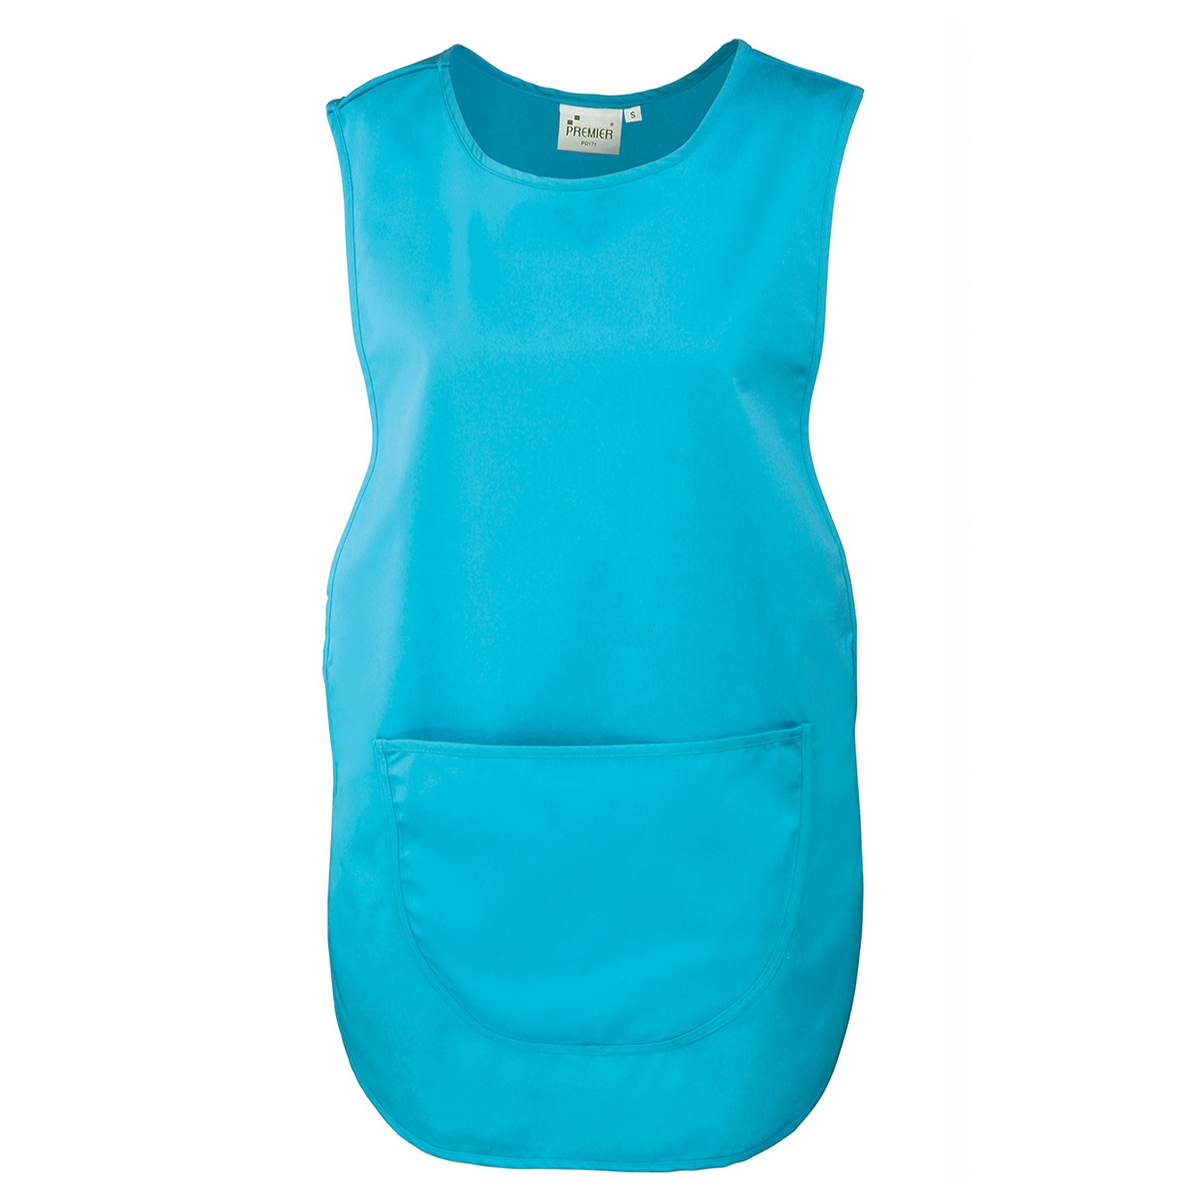 TURQ   turquoise